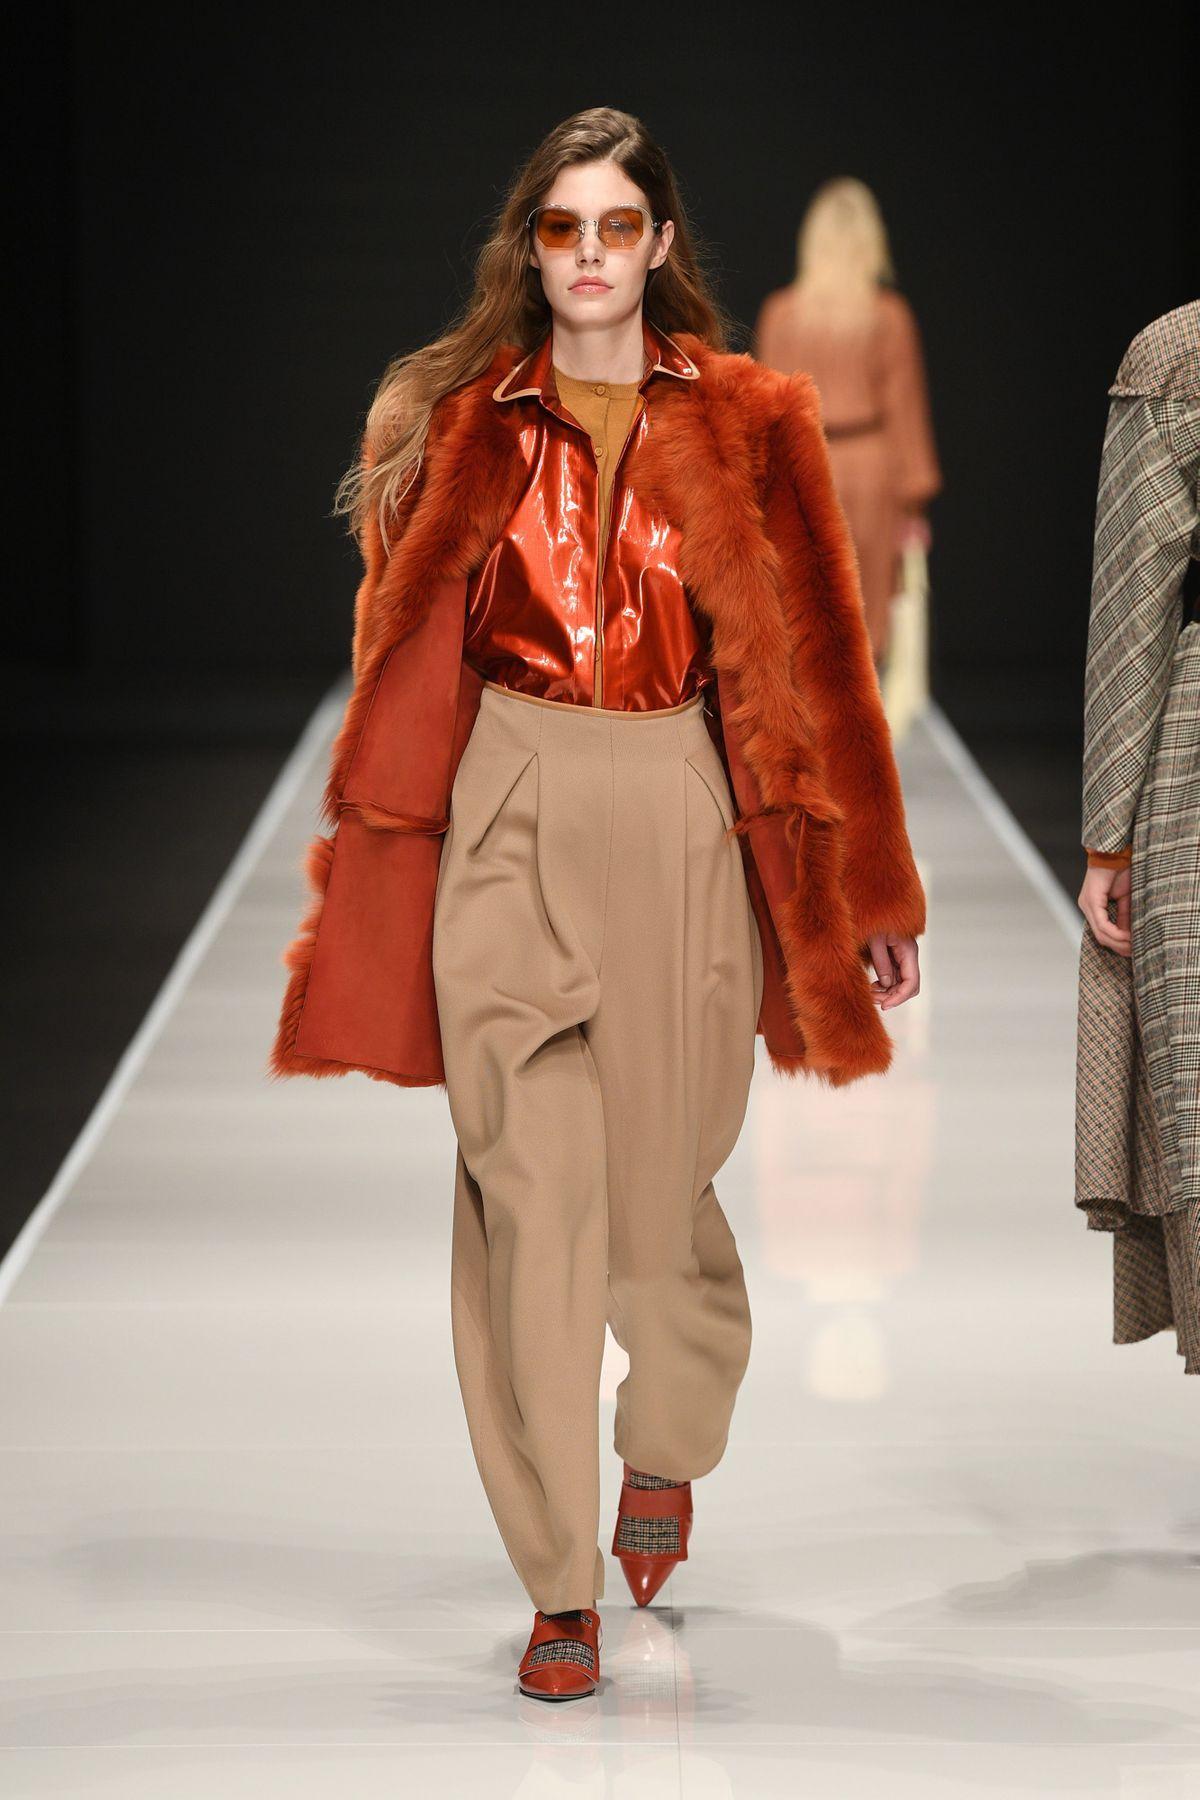 2a6488a3cd2 Anteprima Ready To Wear Fall Winter 2019 Milan - NOWFASHION